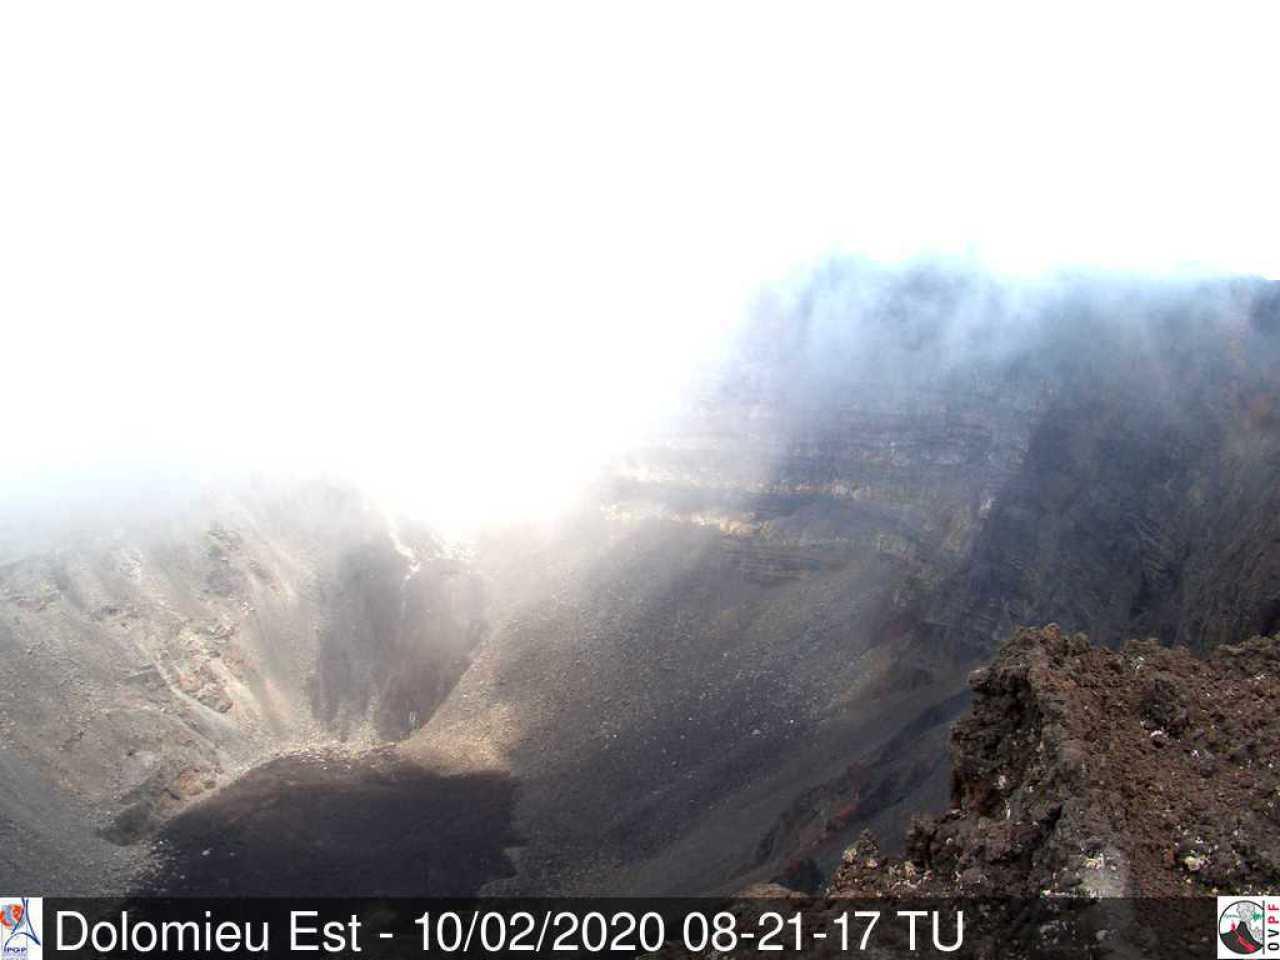 Piton de la Fournaise volcano this morning (image: OVPF)